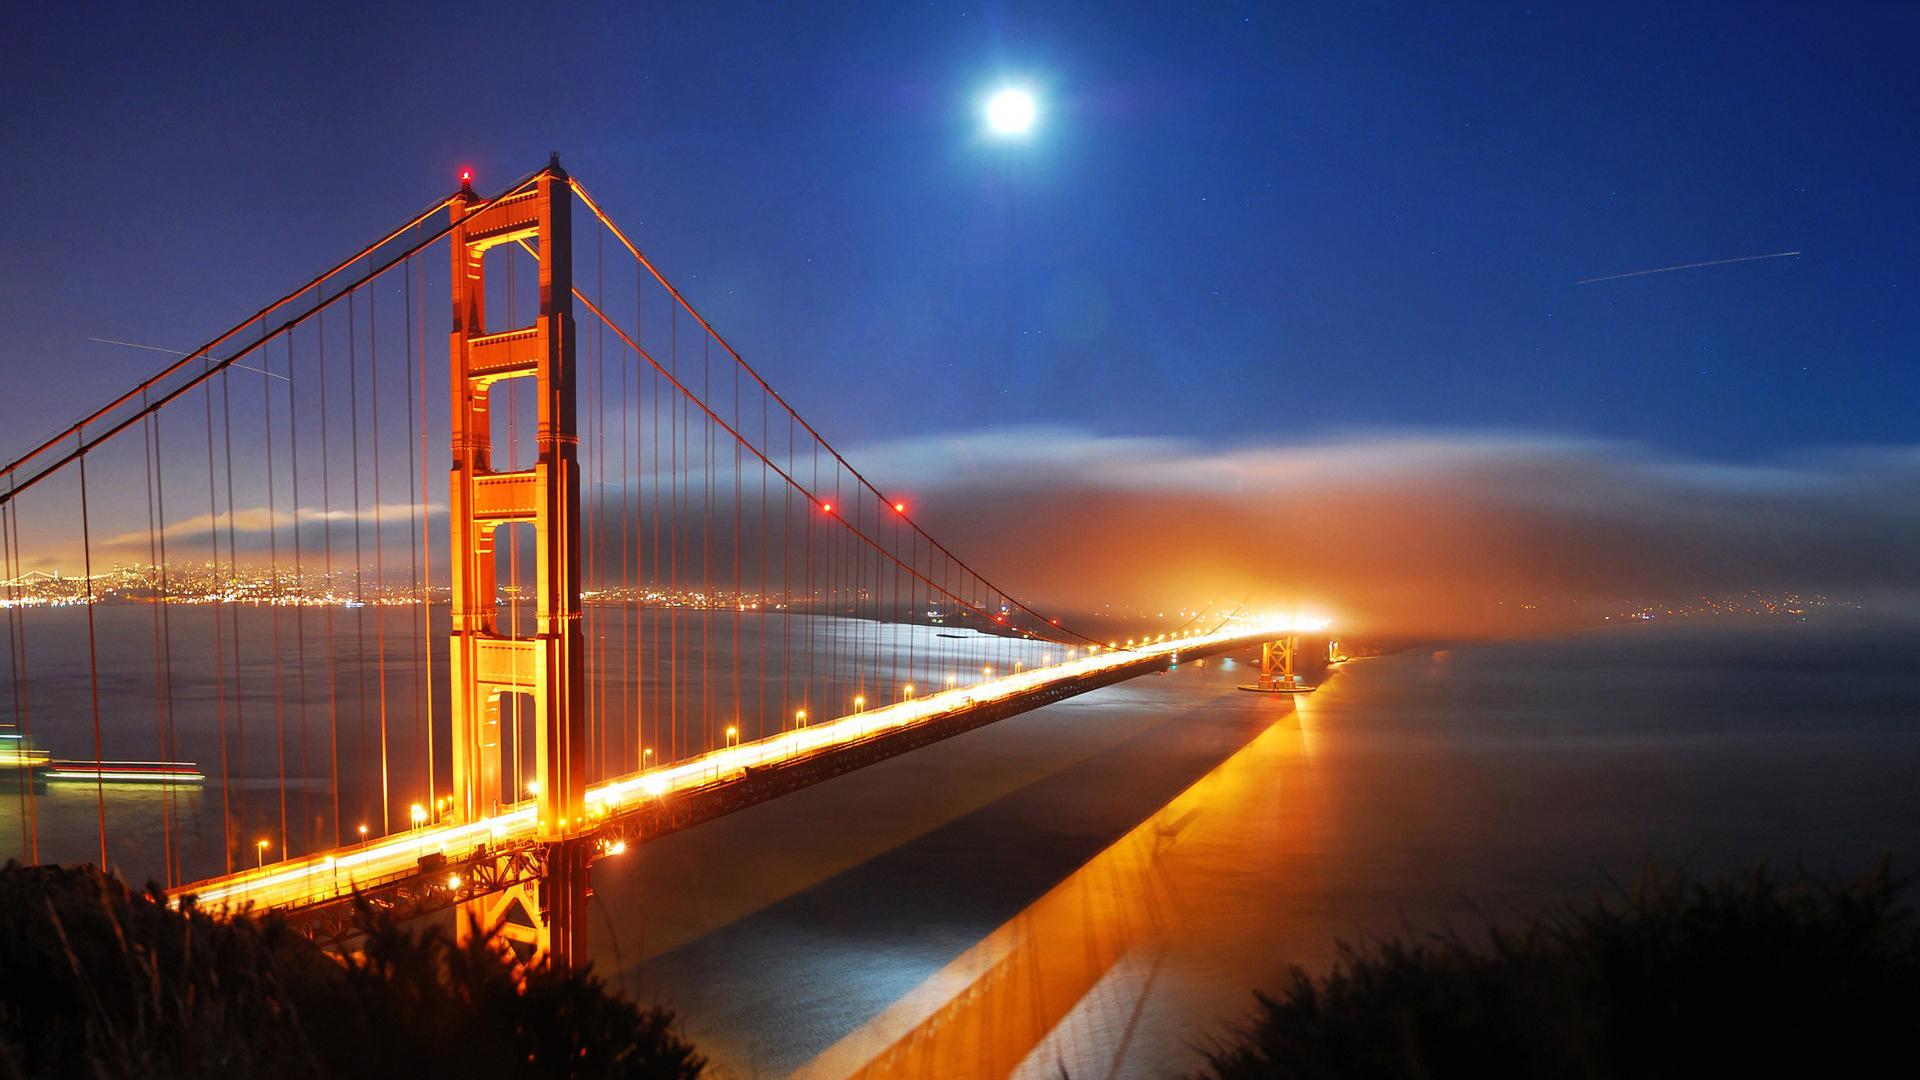 Golden Gate Bridge Wallpapers, Pictures, Images